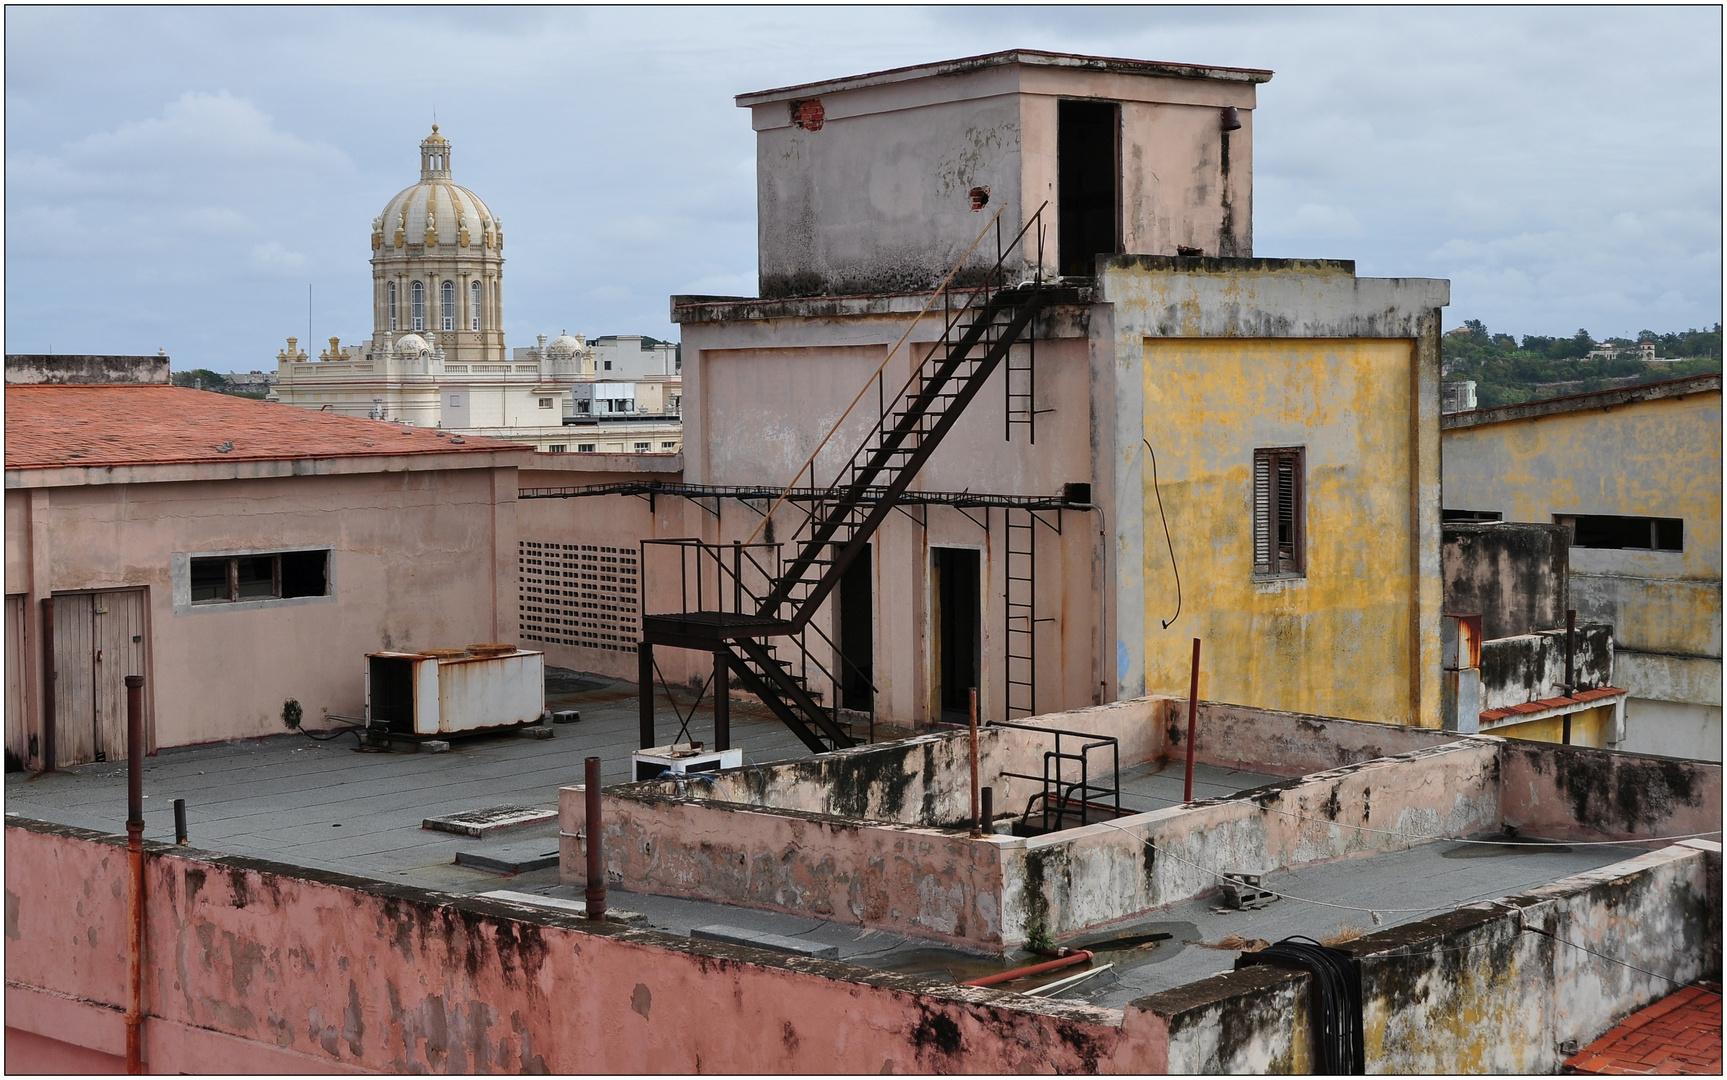 La Habana Hinterhof Foto Bild North America Central